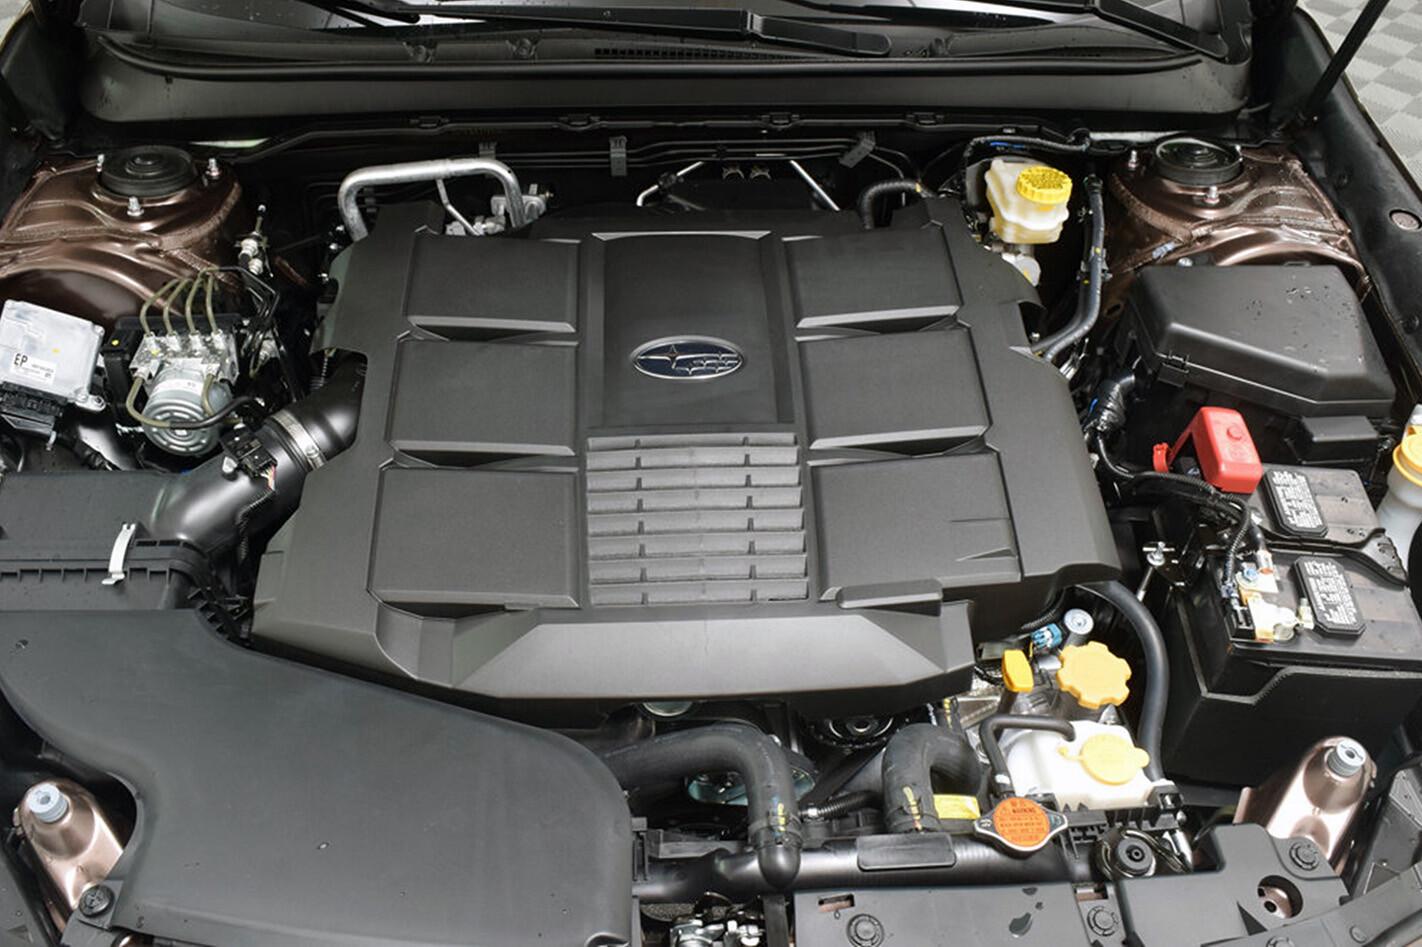 Subaru Outback 3.6R engine